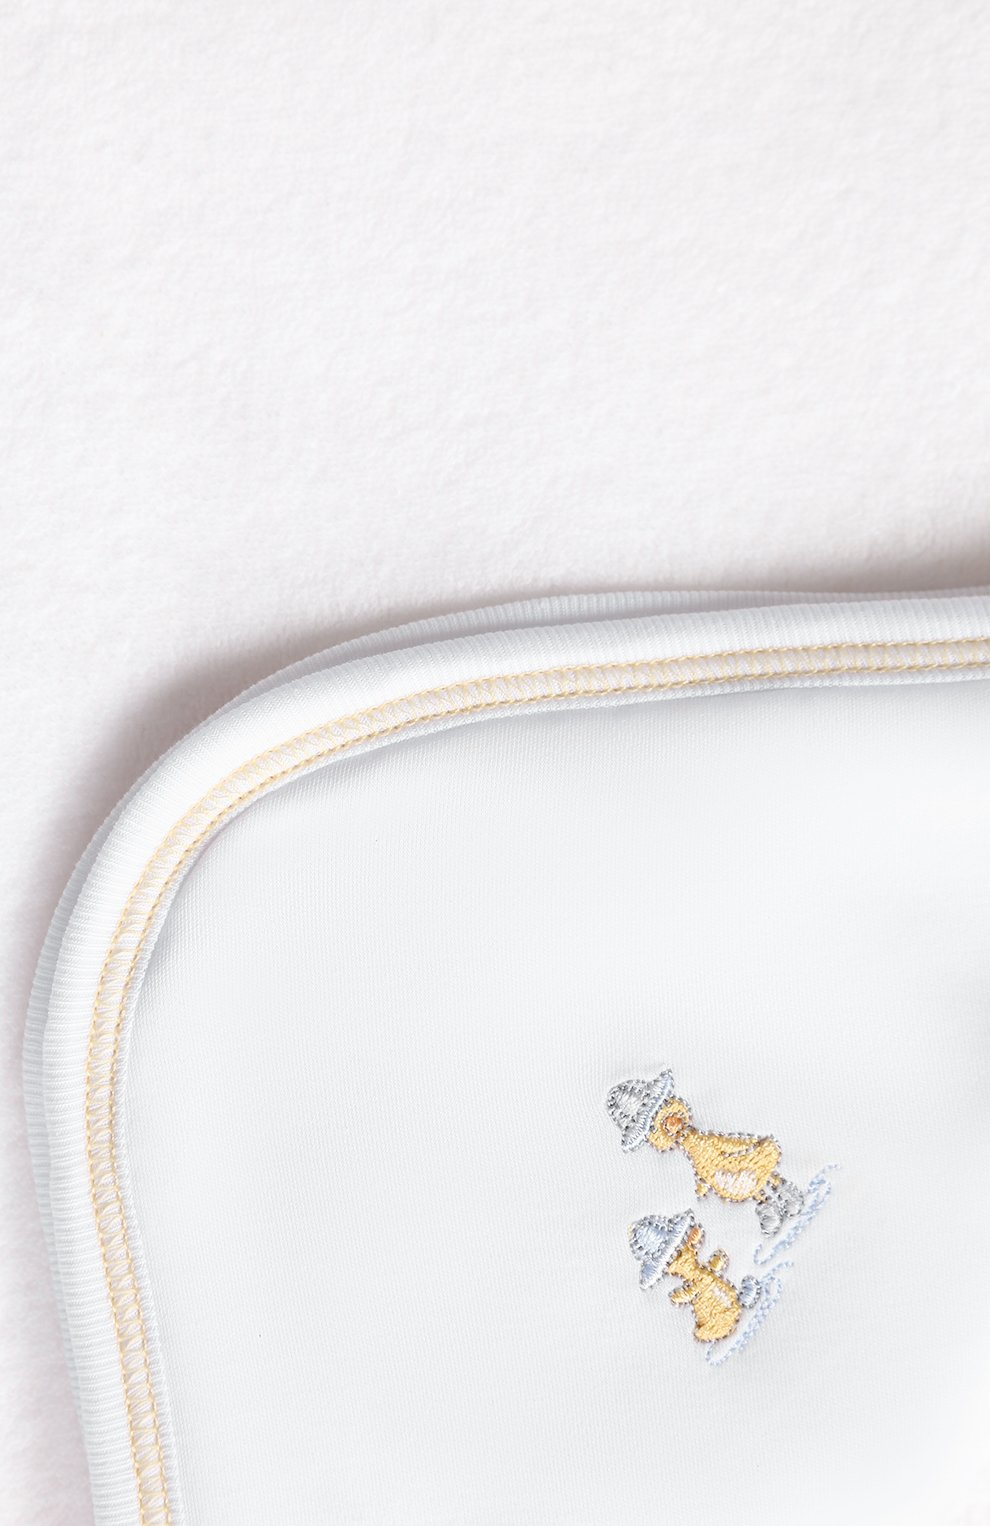 Детского комплект из полотенца и рукавицы KISSY KISSY белого цвета, арт. KN403463O | Фото 5 (Материал: Текстиль, Хлопок)